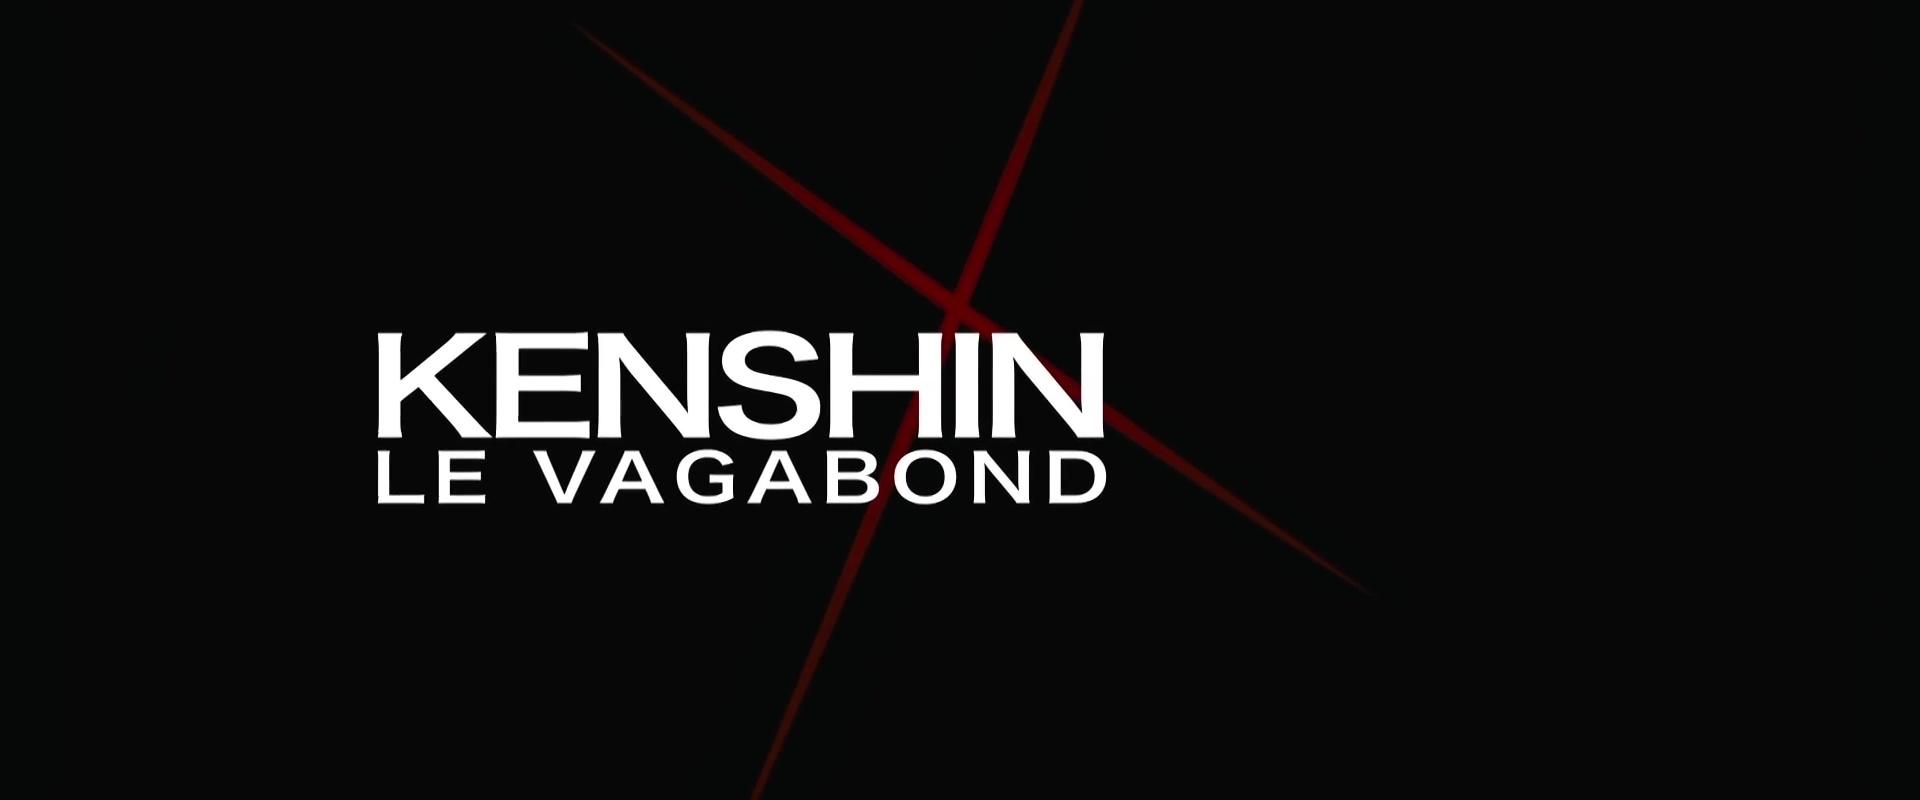 KENSHIN LE VAGABOND (るろうに剣心) de Ôtomo Keishi (2012)